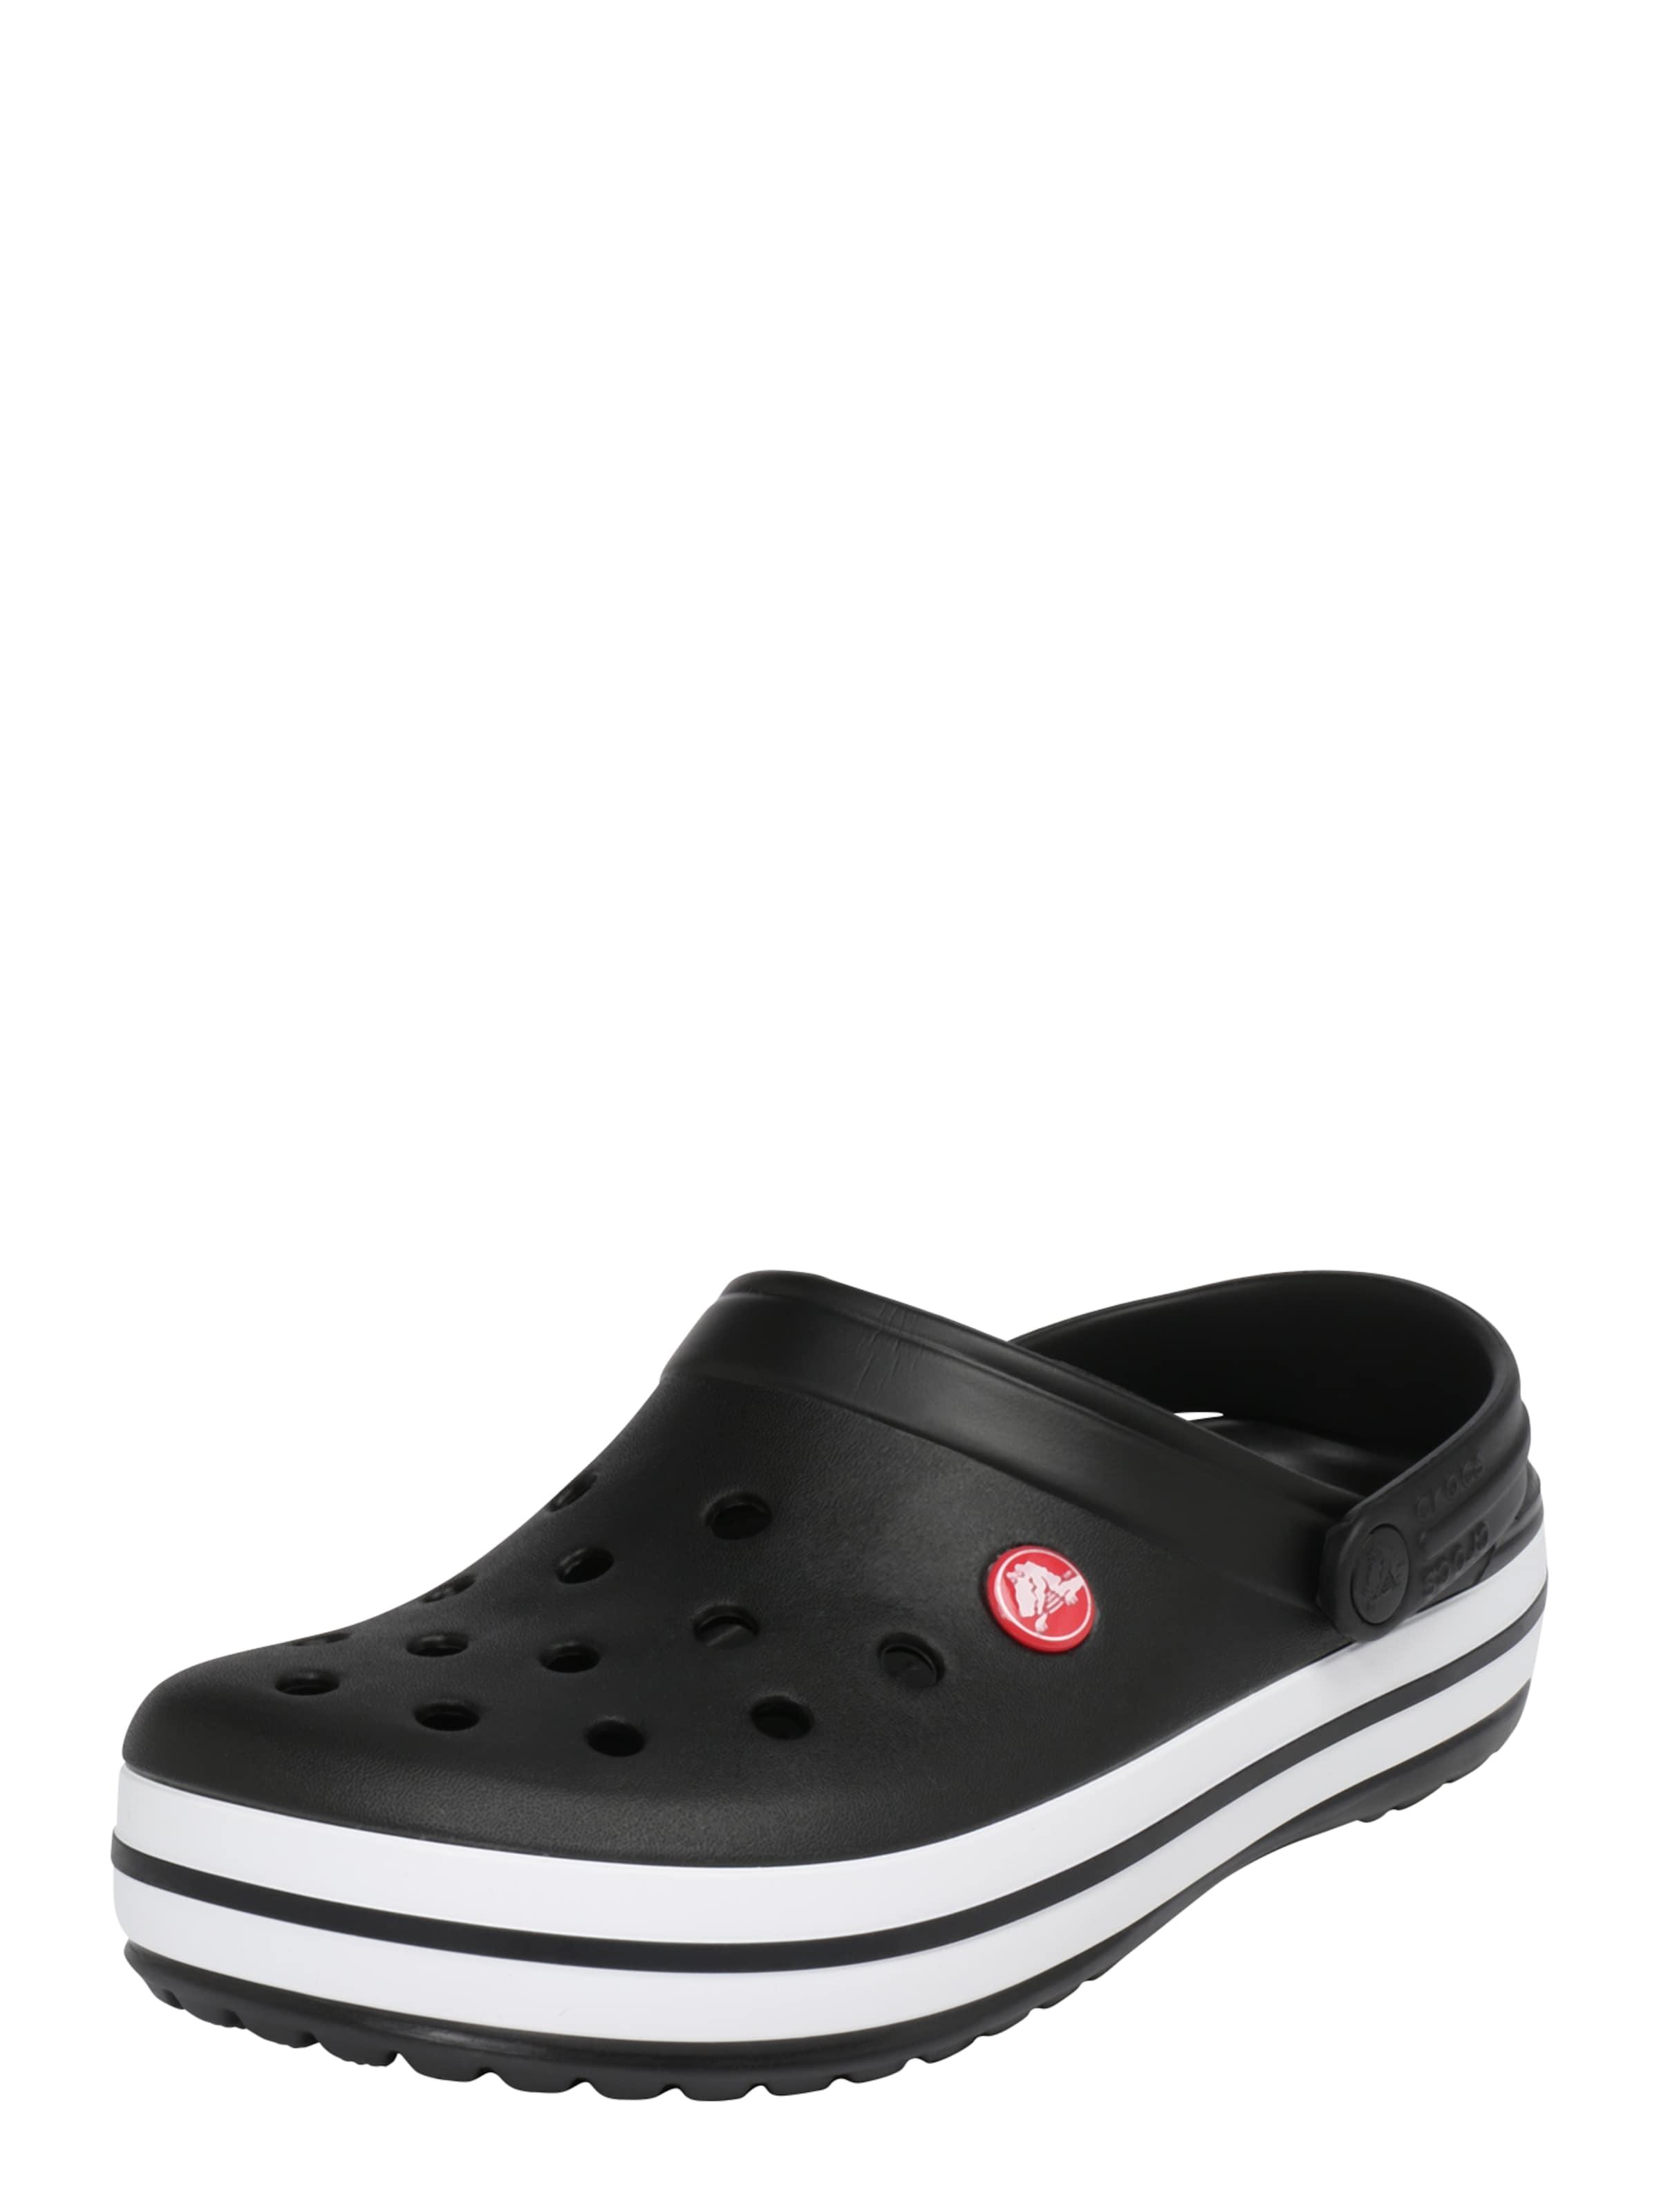 Crocs Pantolette Crocband Verschleißfeste billige Schuhe